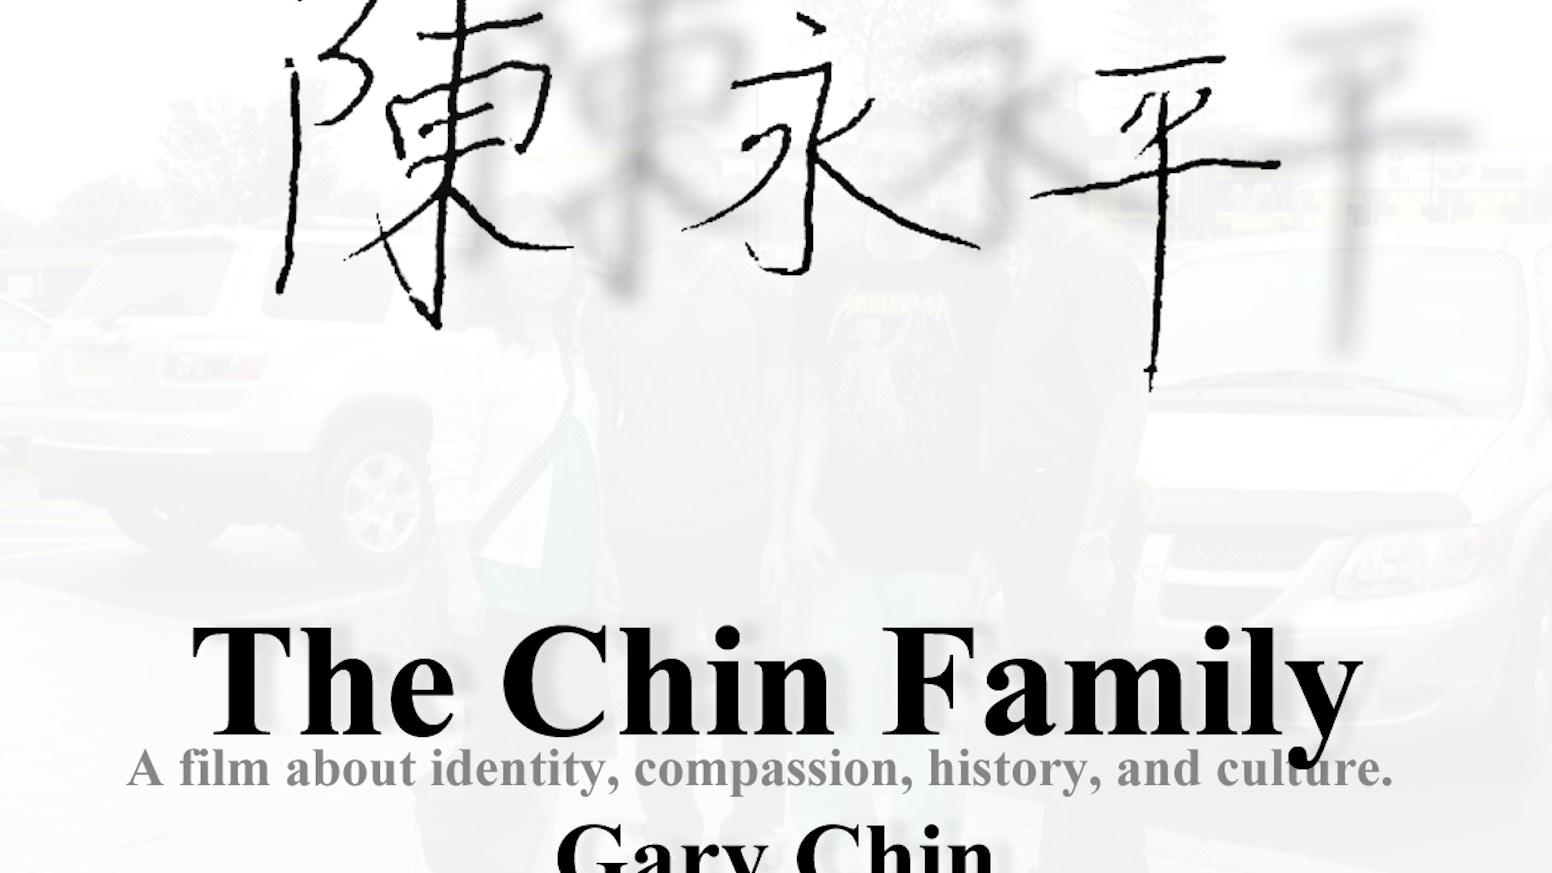 the chin family family love identity and history by gary chin